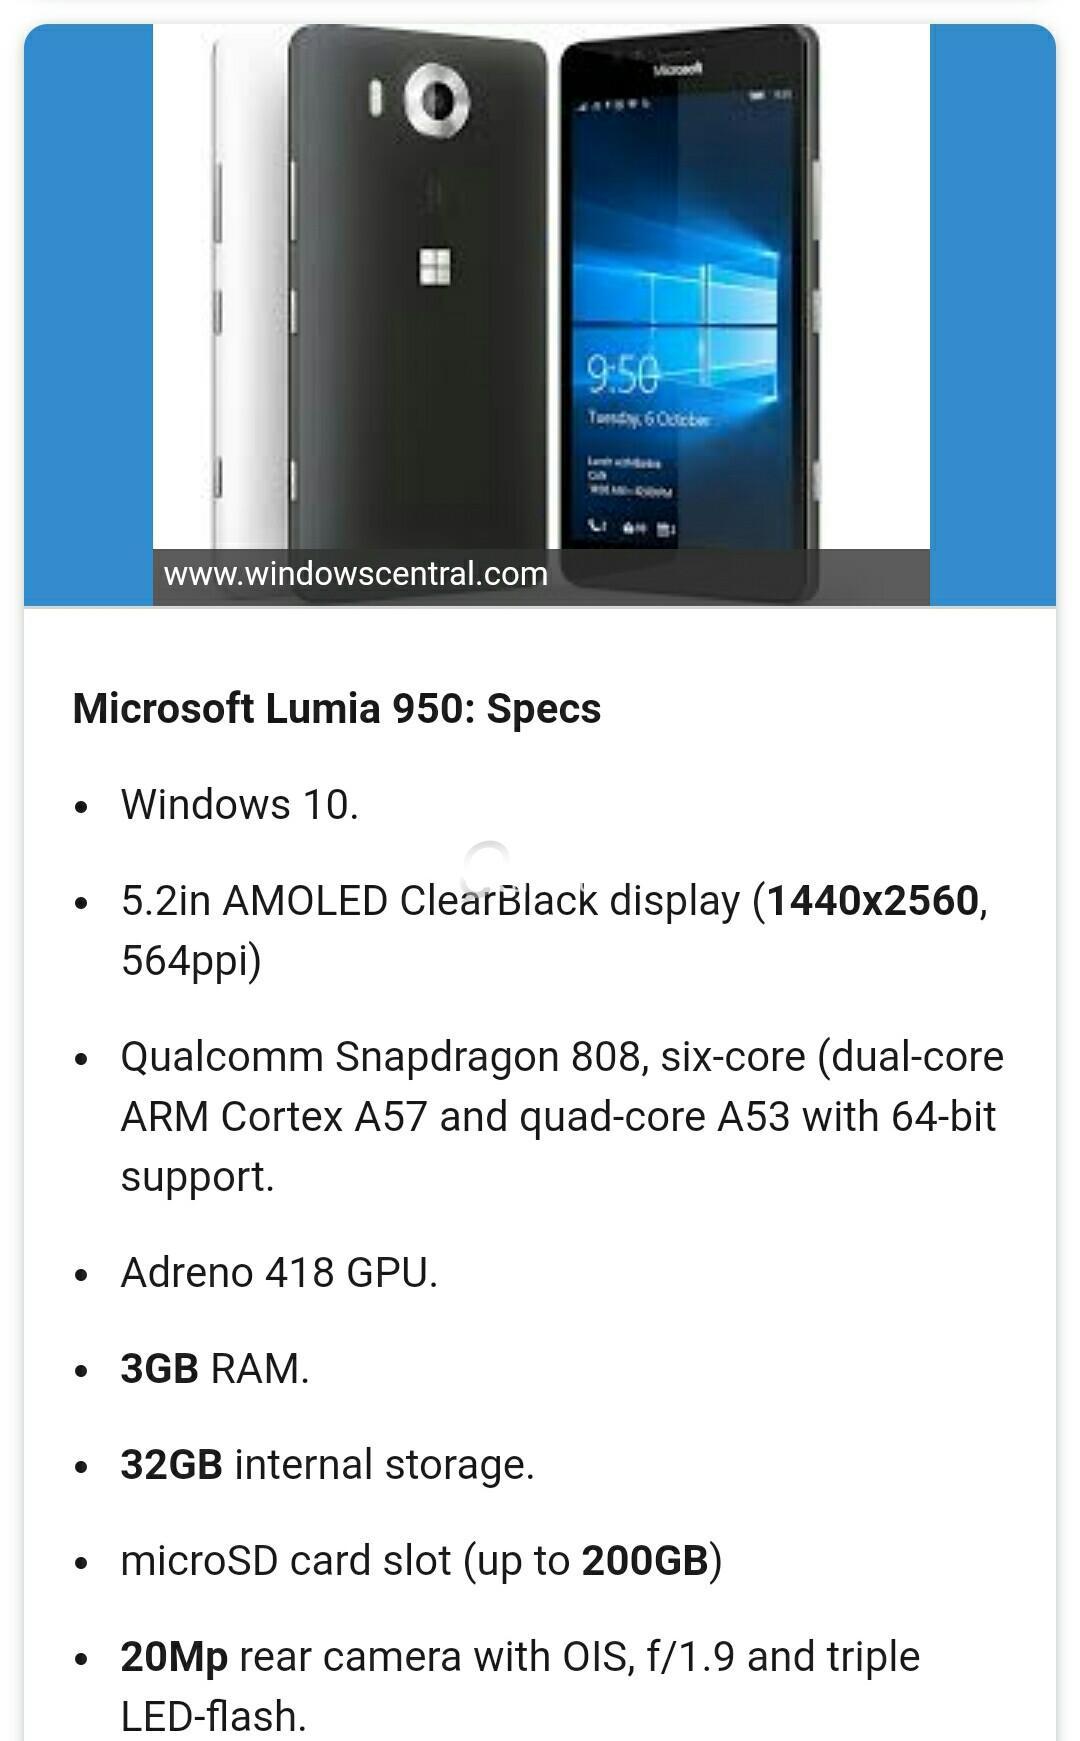 Microsoft Lumia 950 | Qatar Living